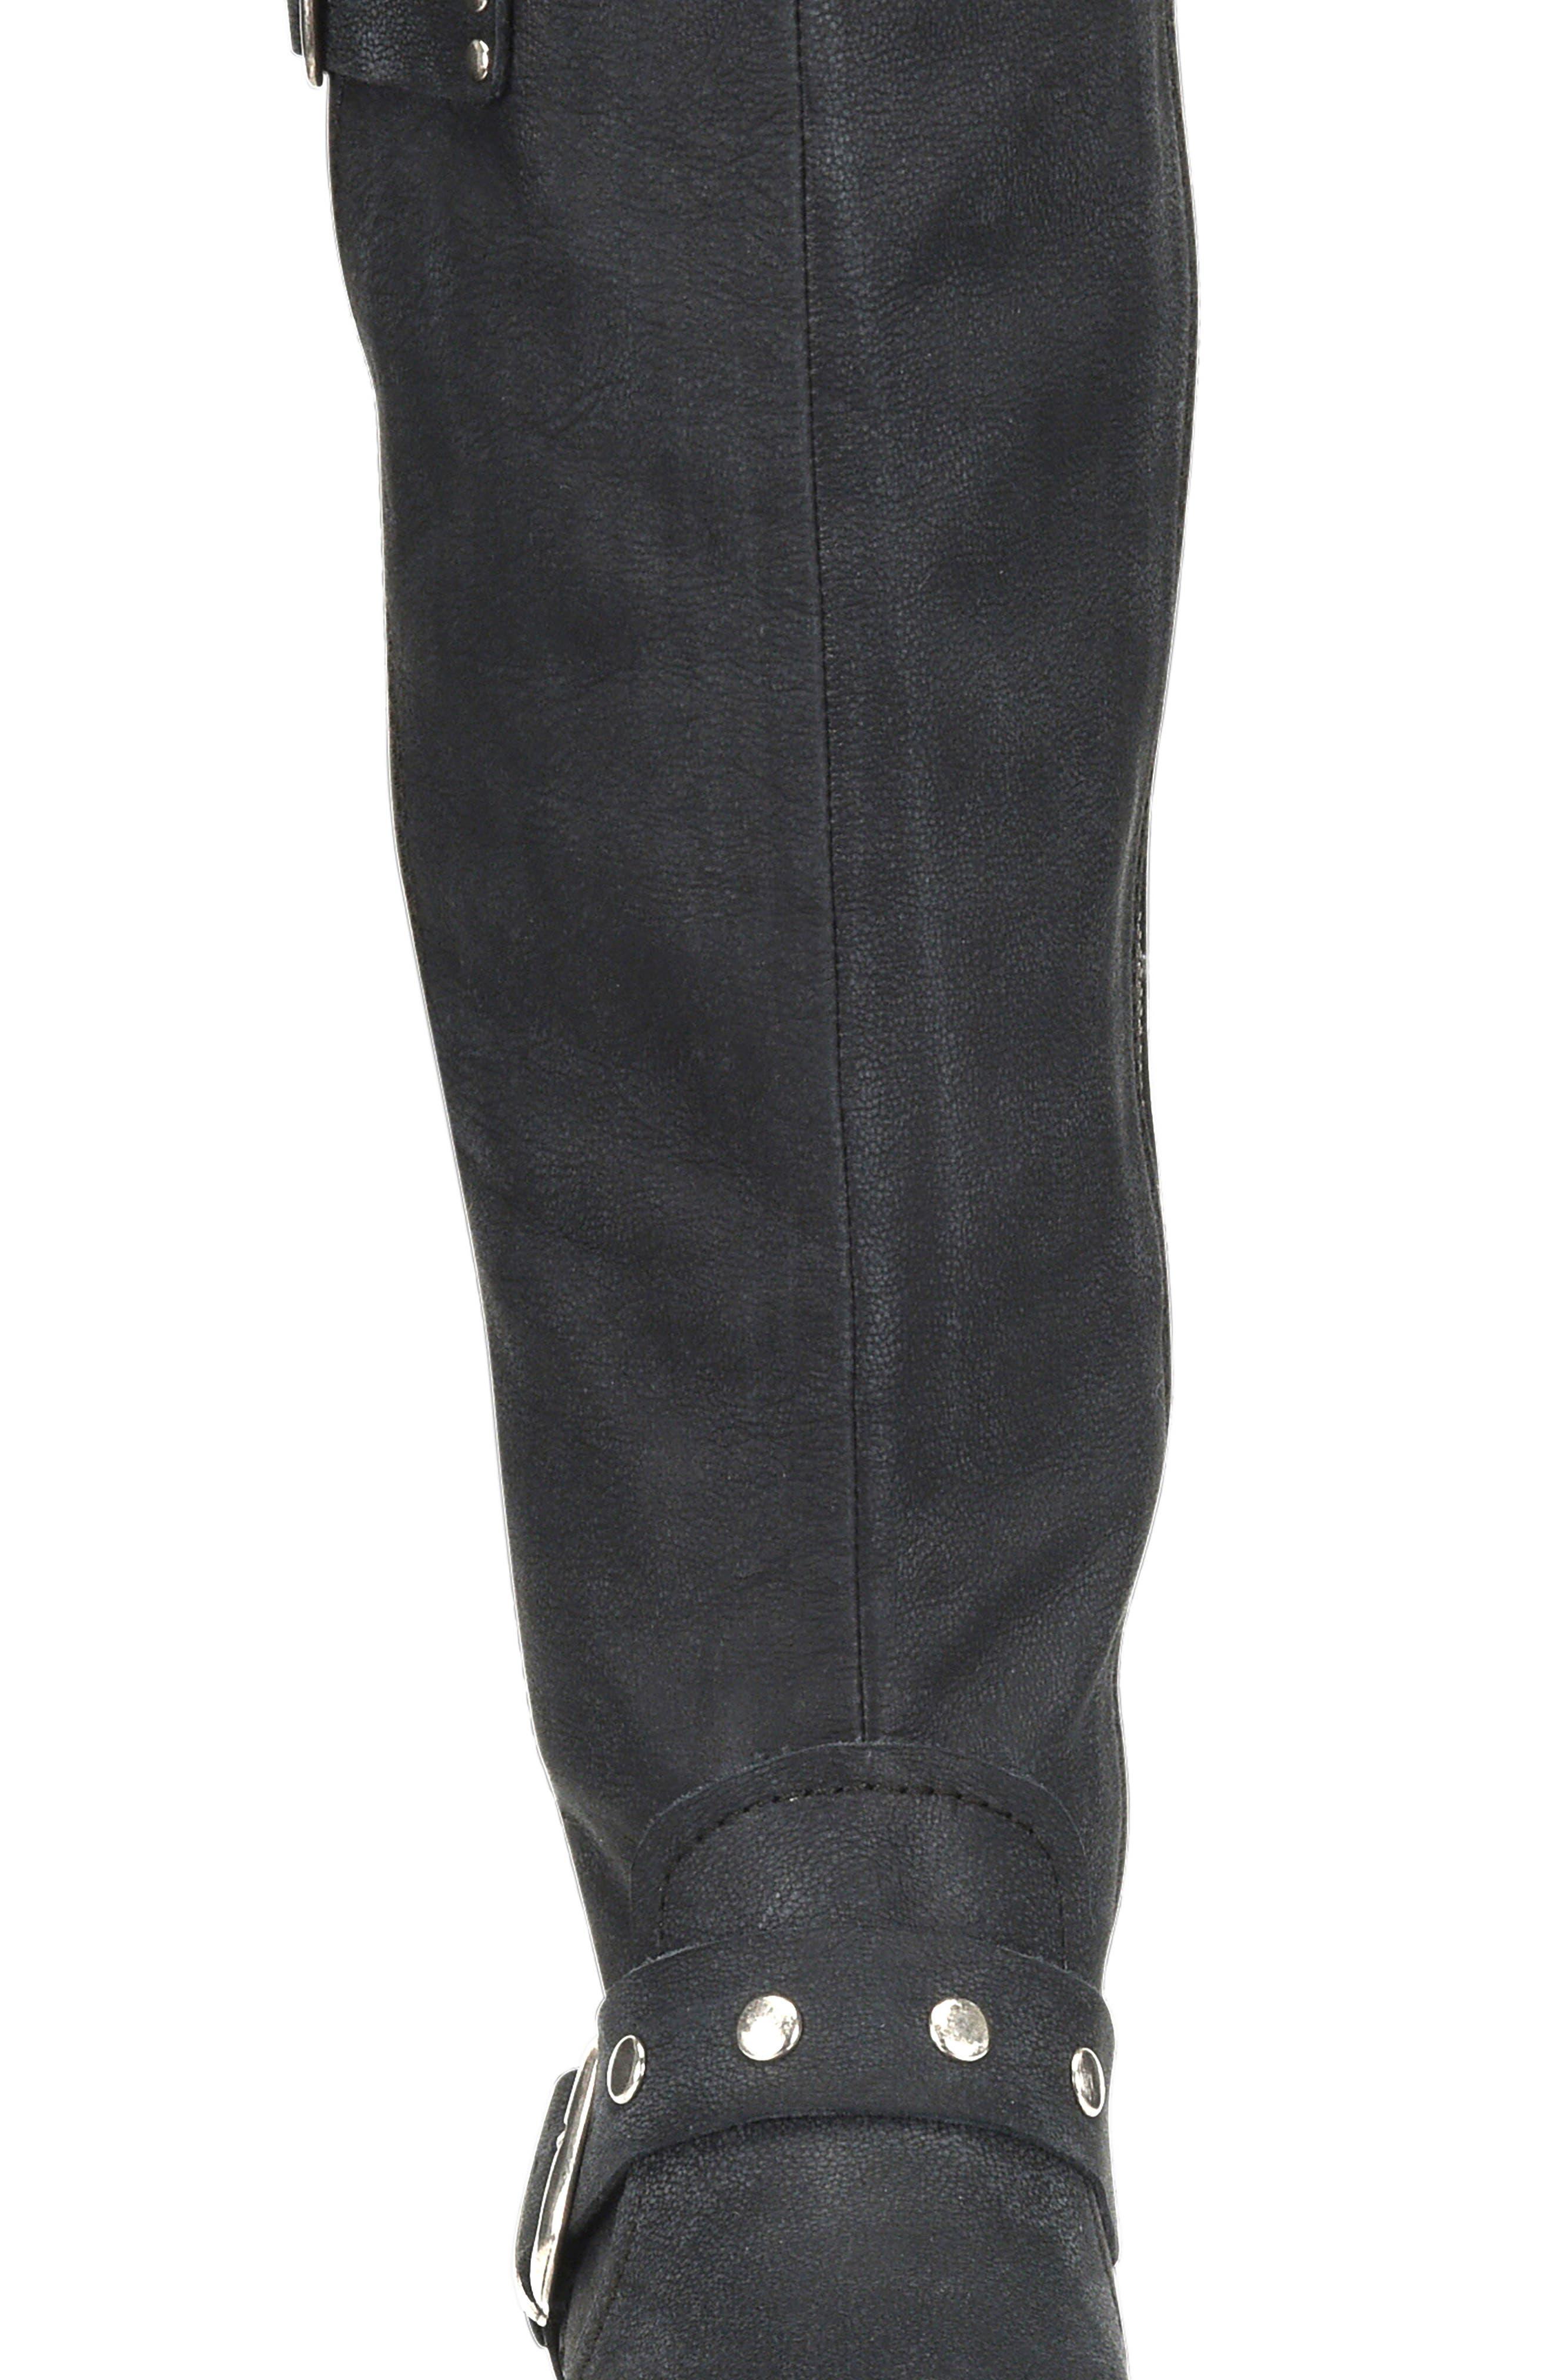 Ashland Knee High Boot,                             Alternate thumbnail 4, color,                             001